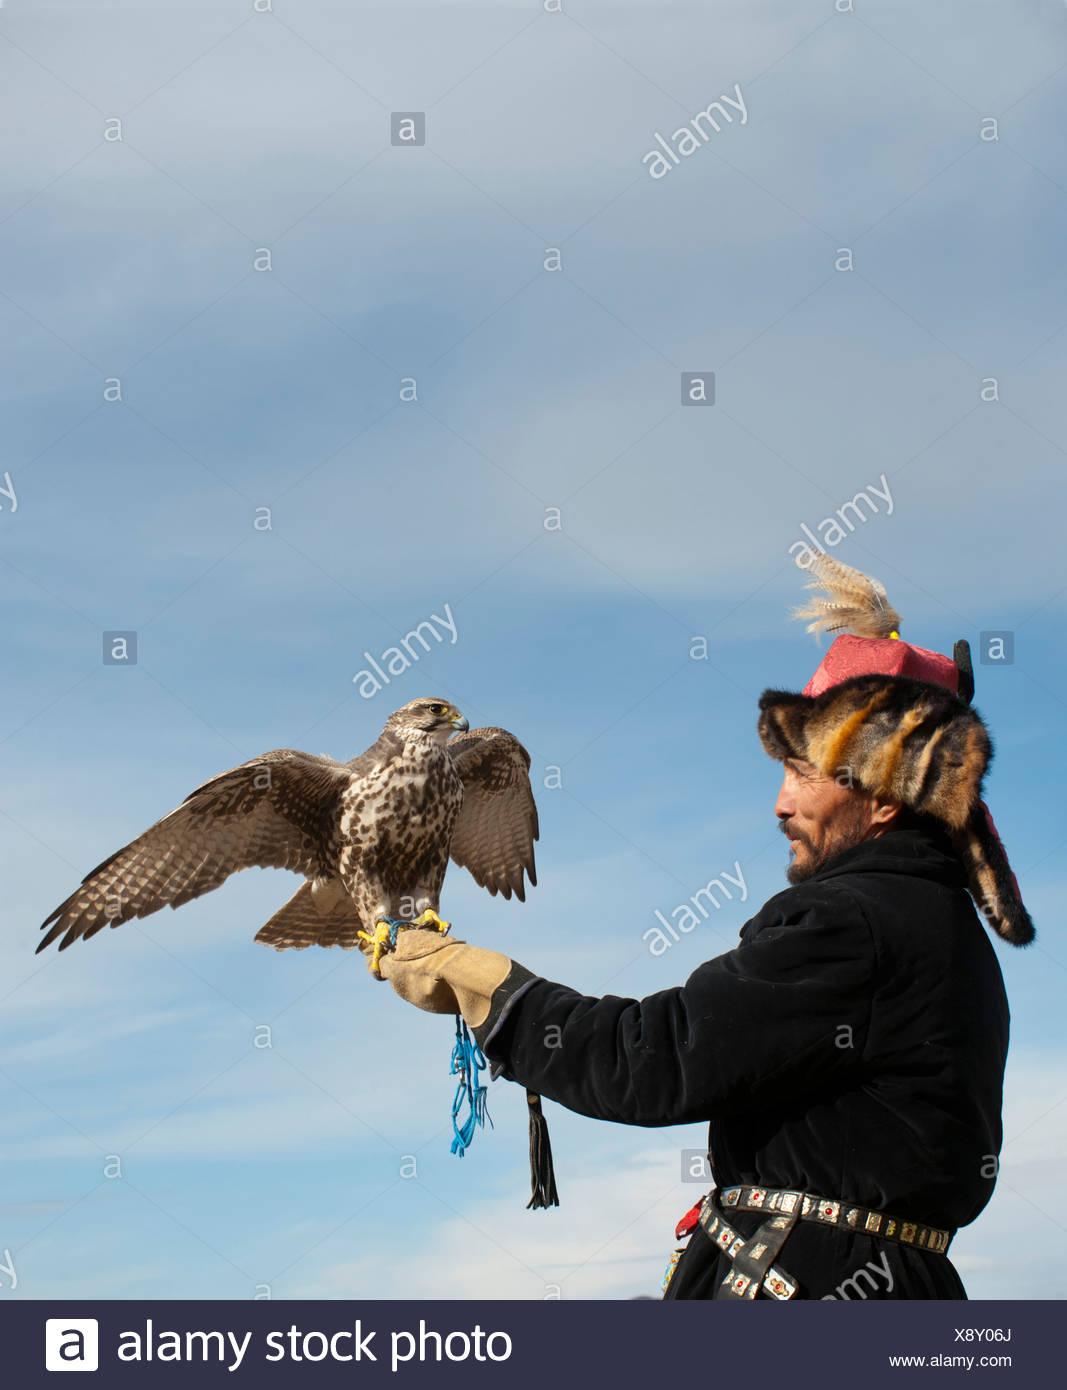 Kazhak Falconer with Saker Falcon at eagle hunters festival in western Mongolia - Stock Image